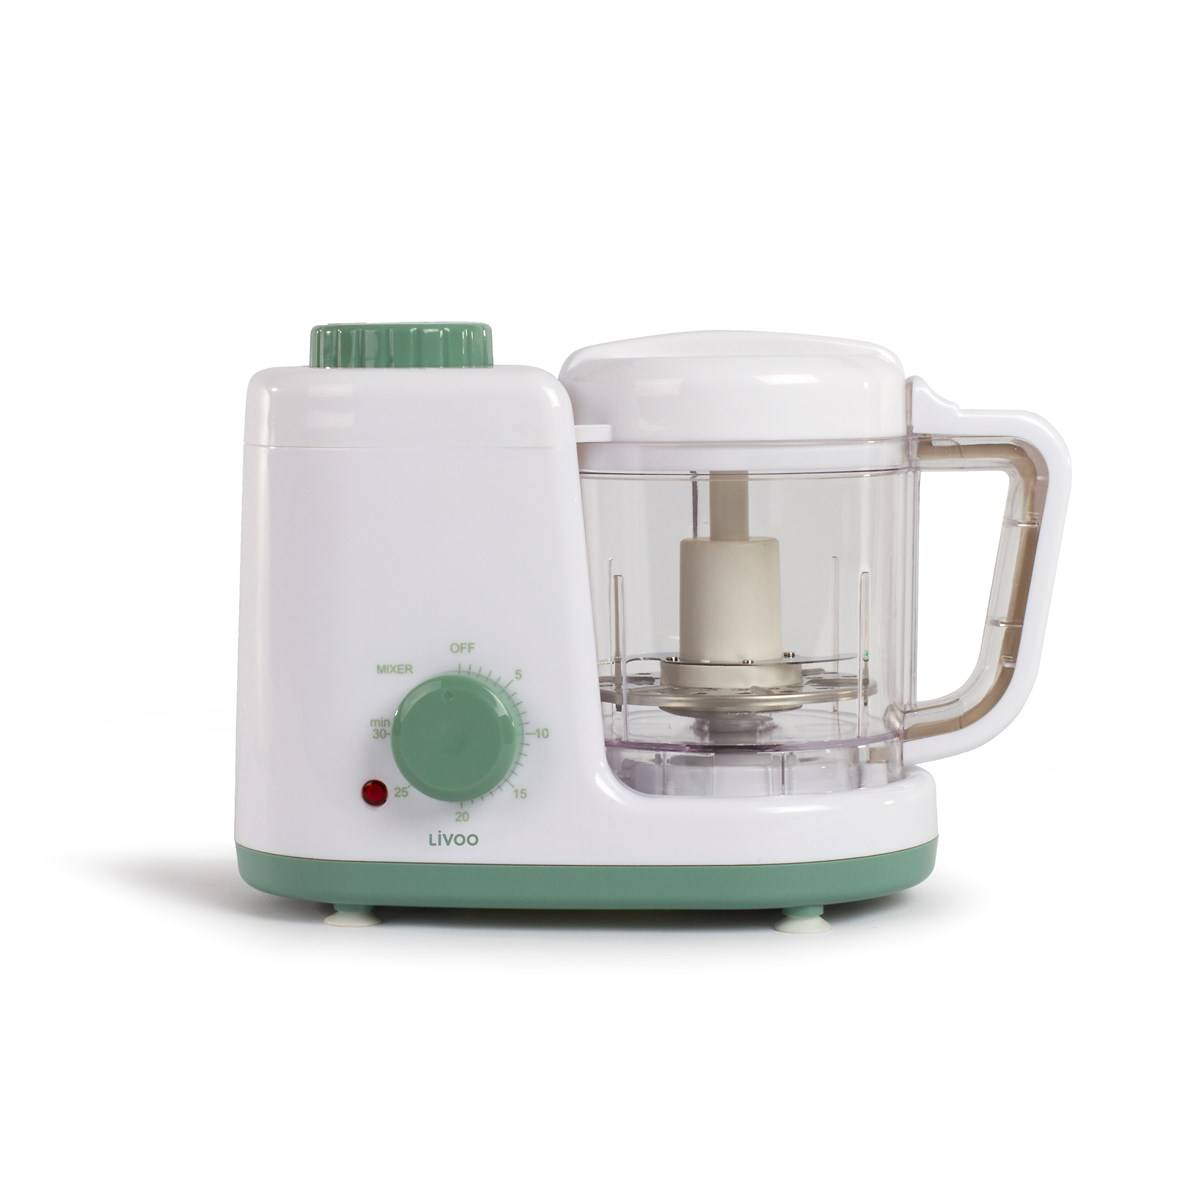 Livoo Robot mixeur cuiseur bébé 4 en 1 en acier inoxydable blanc